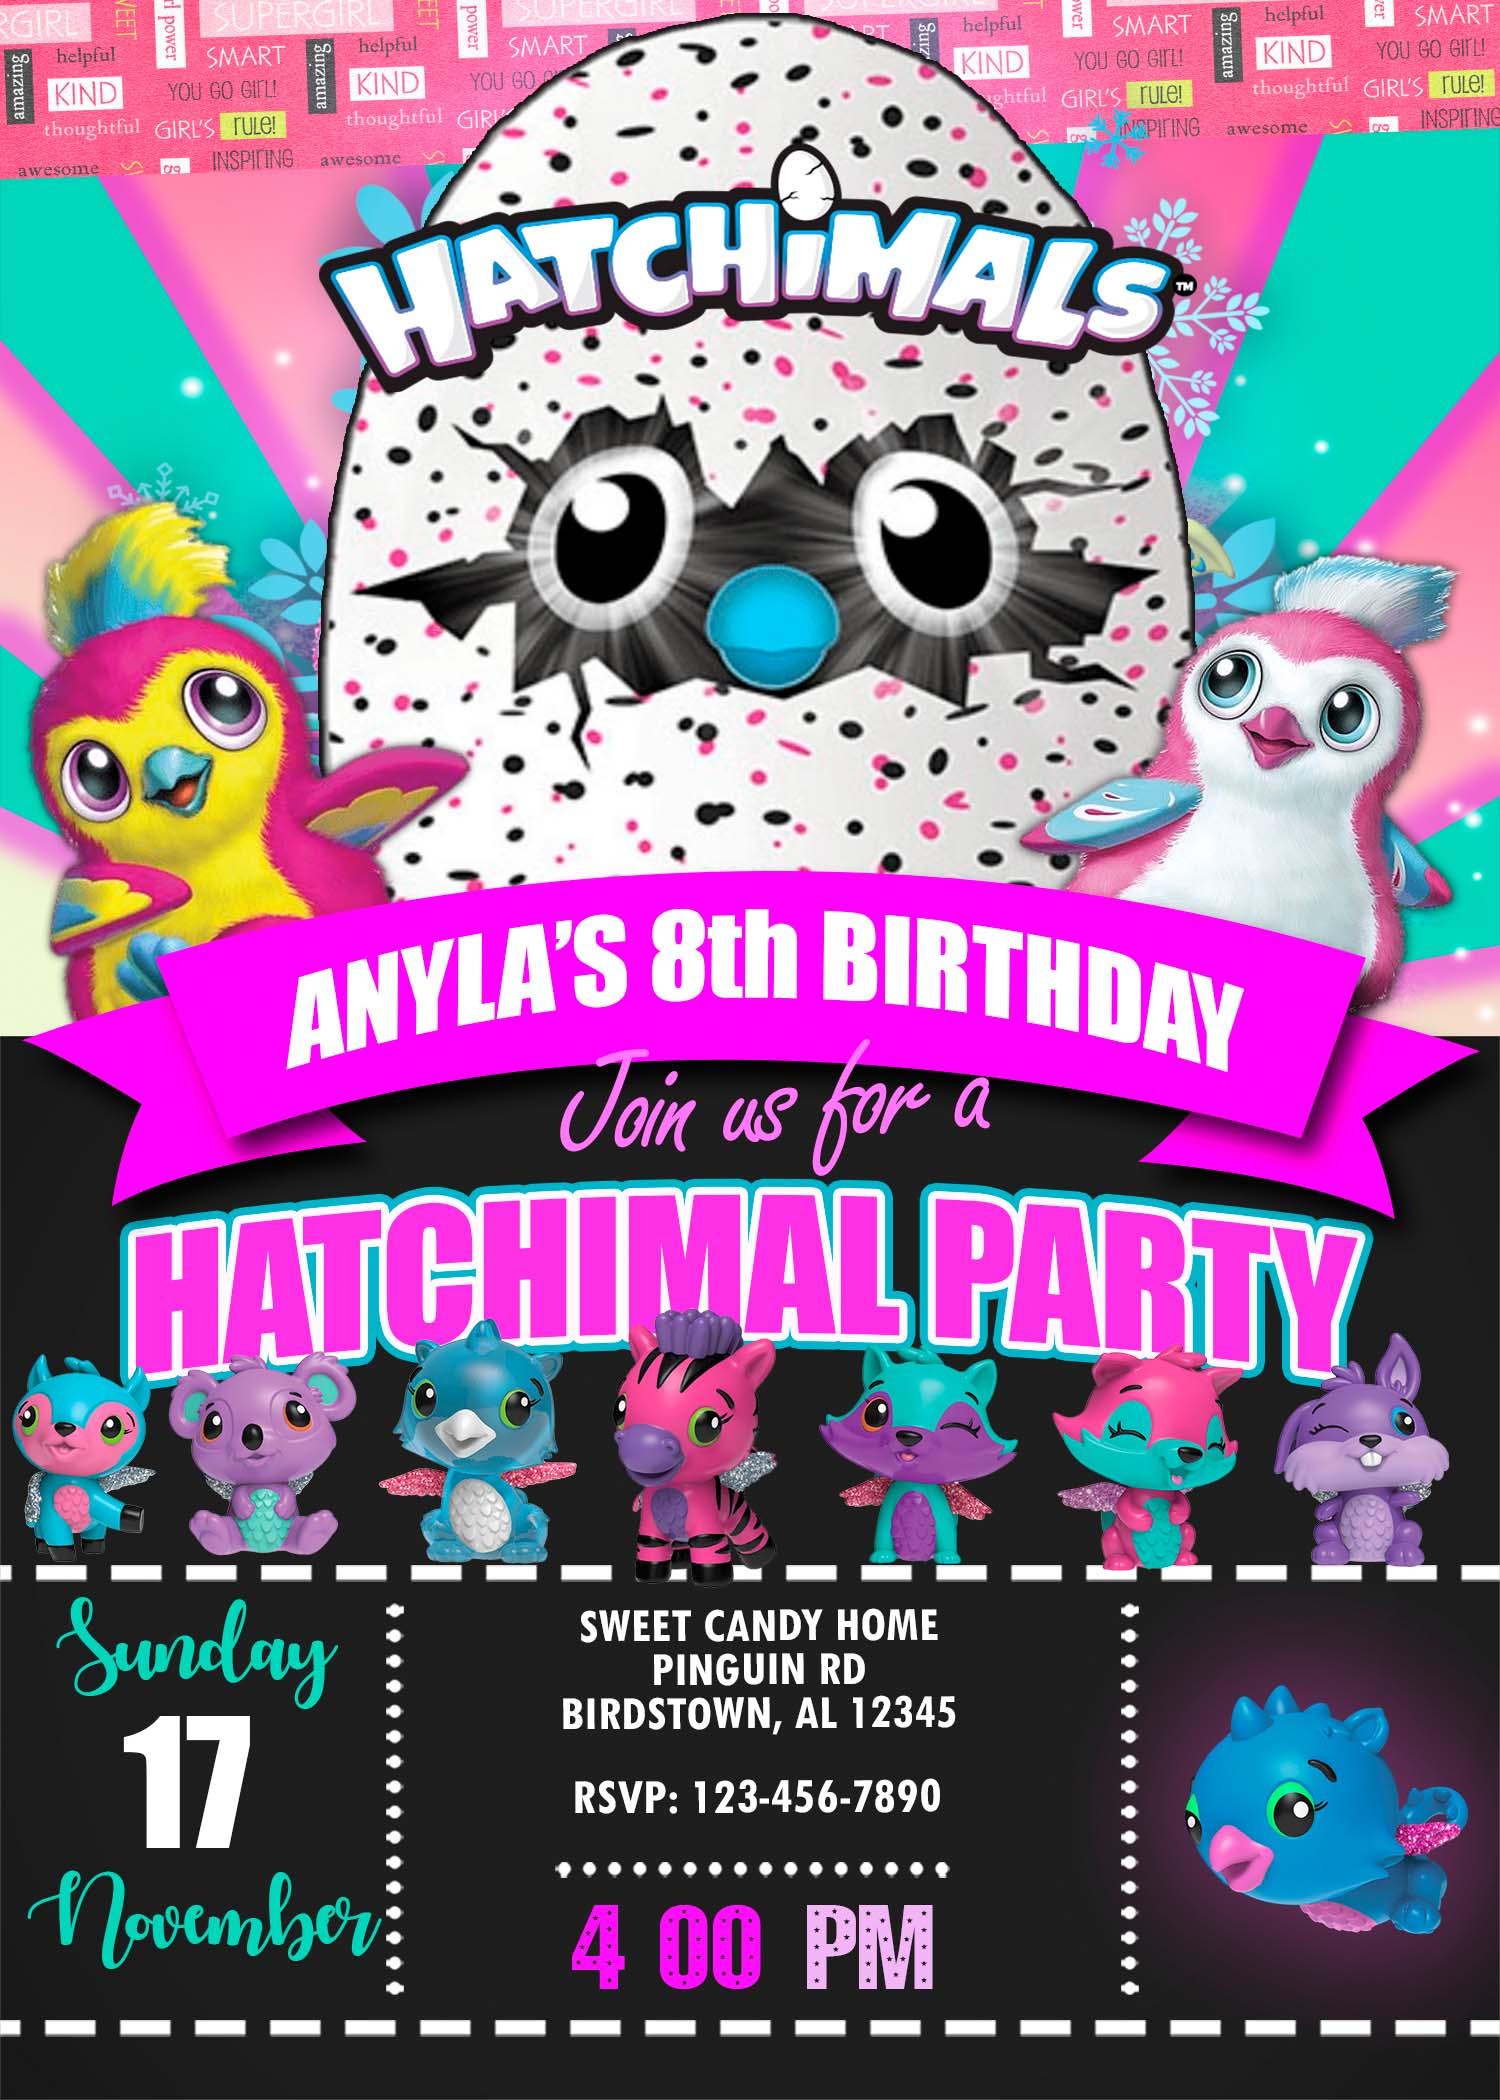 Hatchimals Birthday Party Invitation Cute Digital Invite